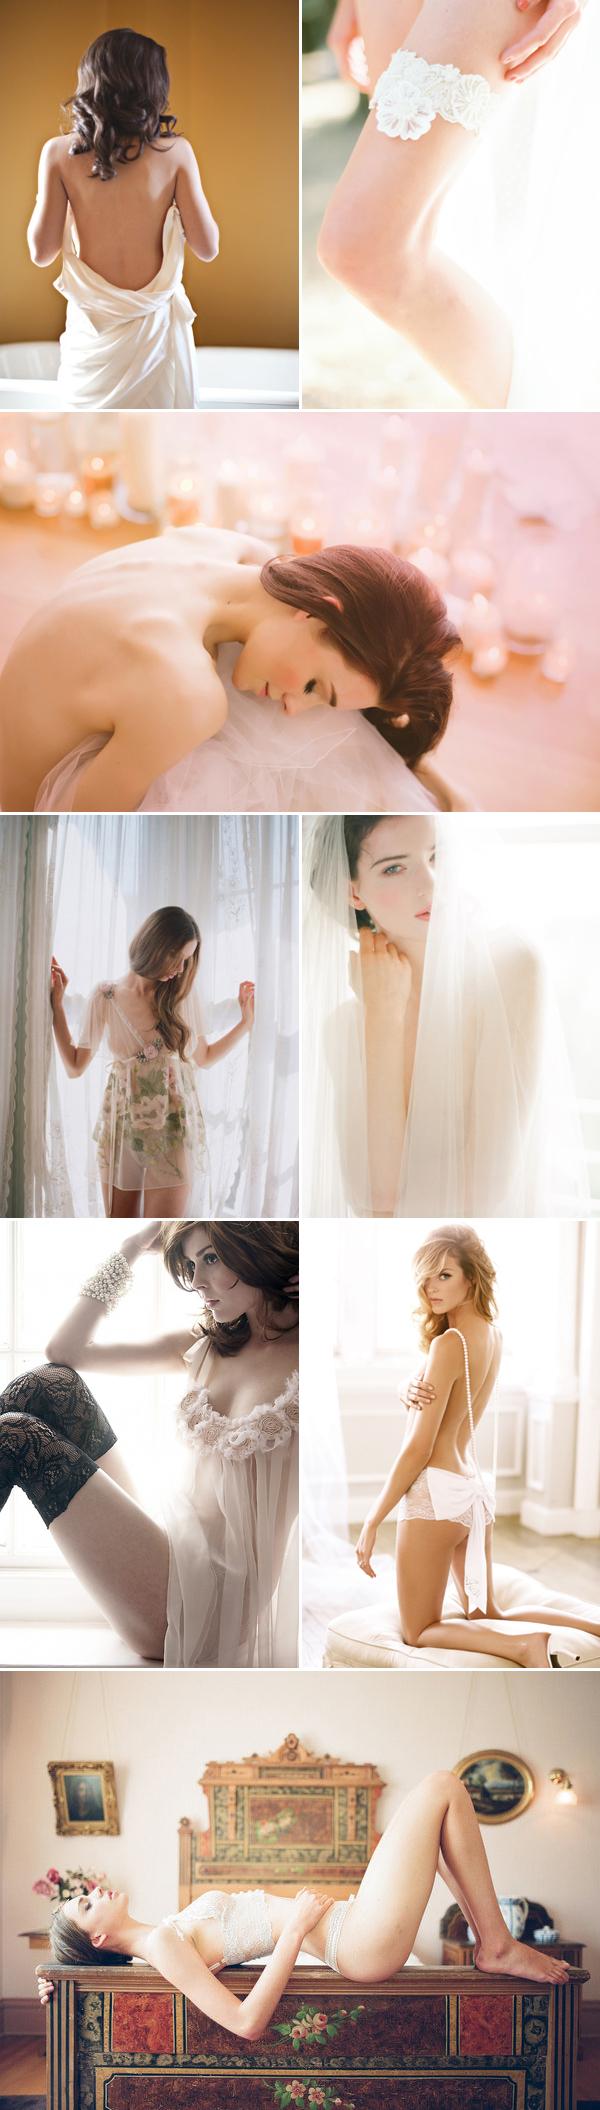 boudoir03-sexy